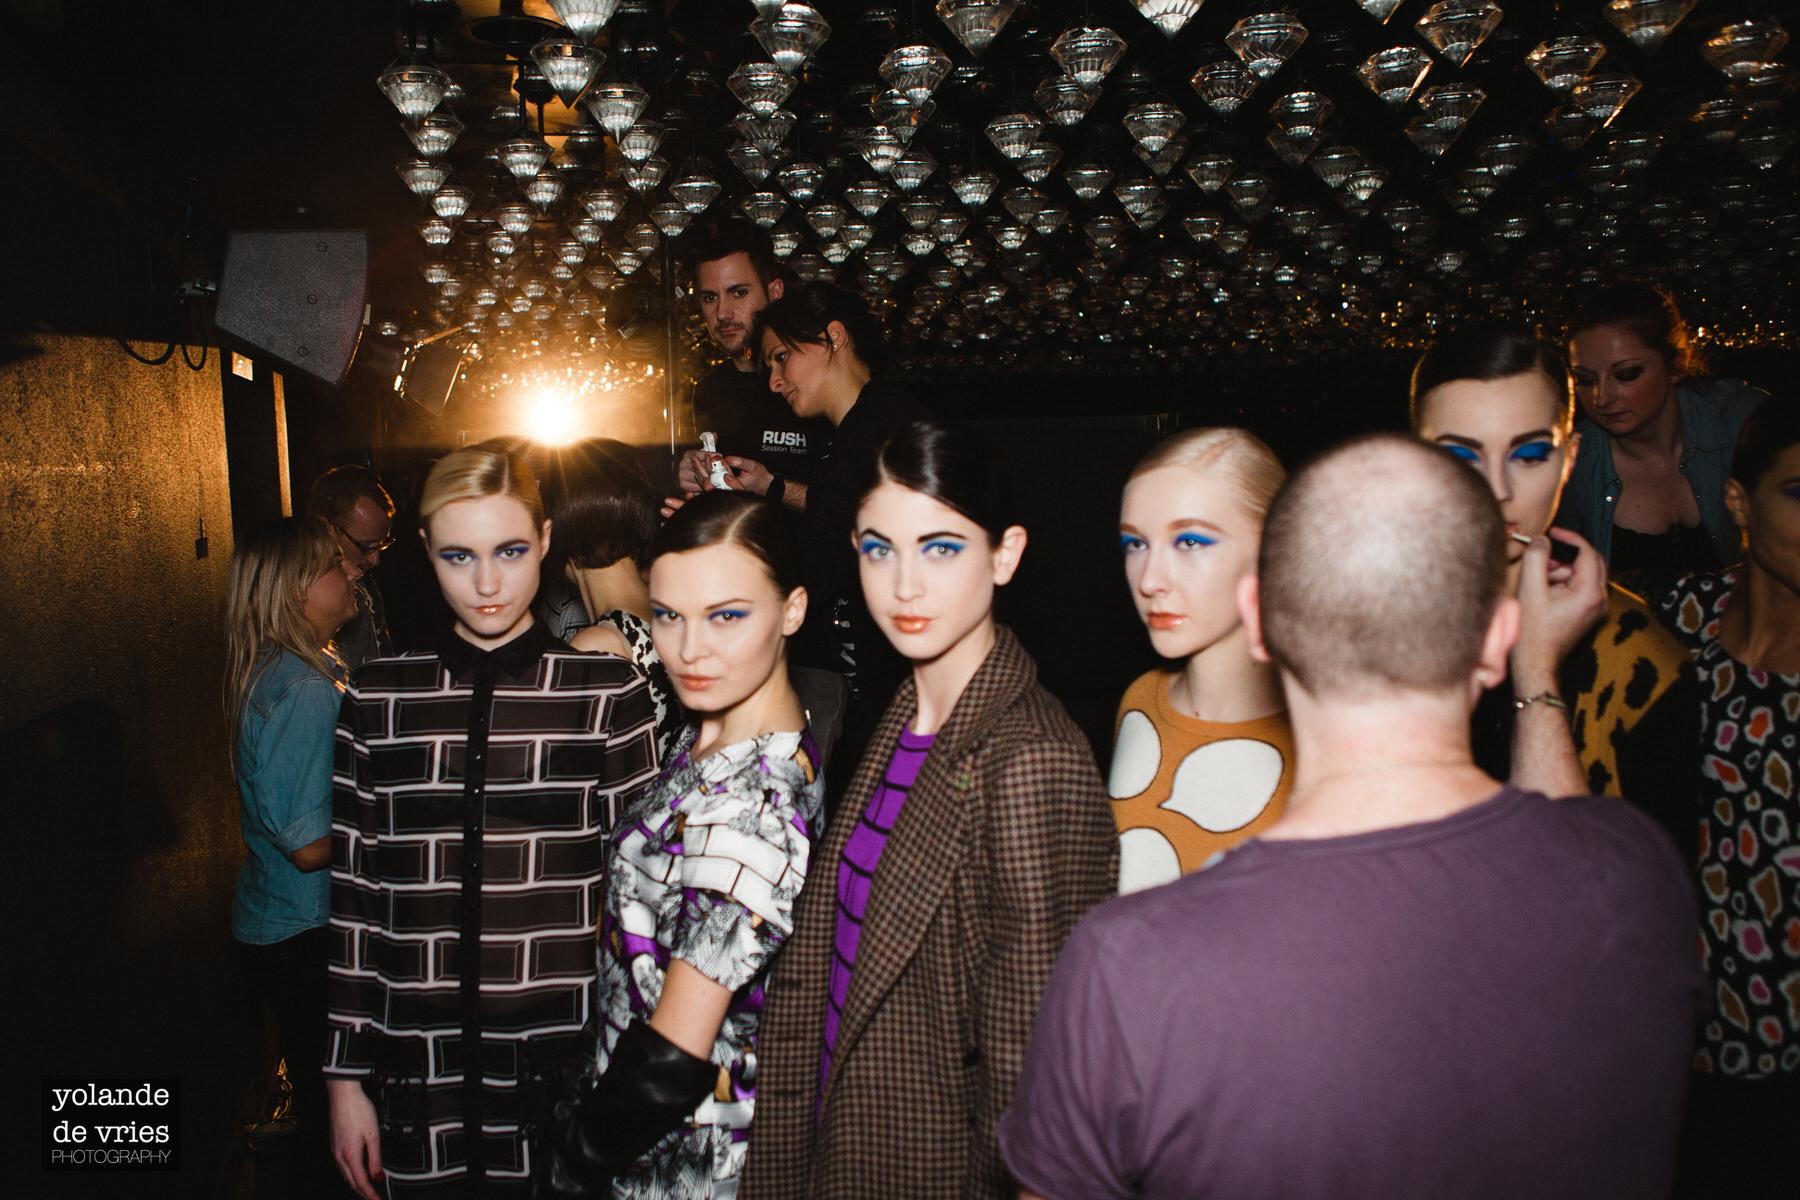 Olivia-Rubin-SS11-London-Fashion-Week-1674.jpg